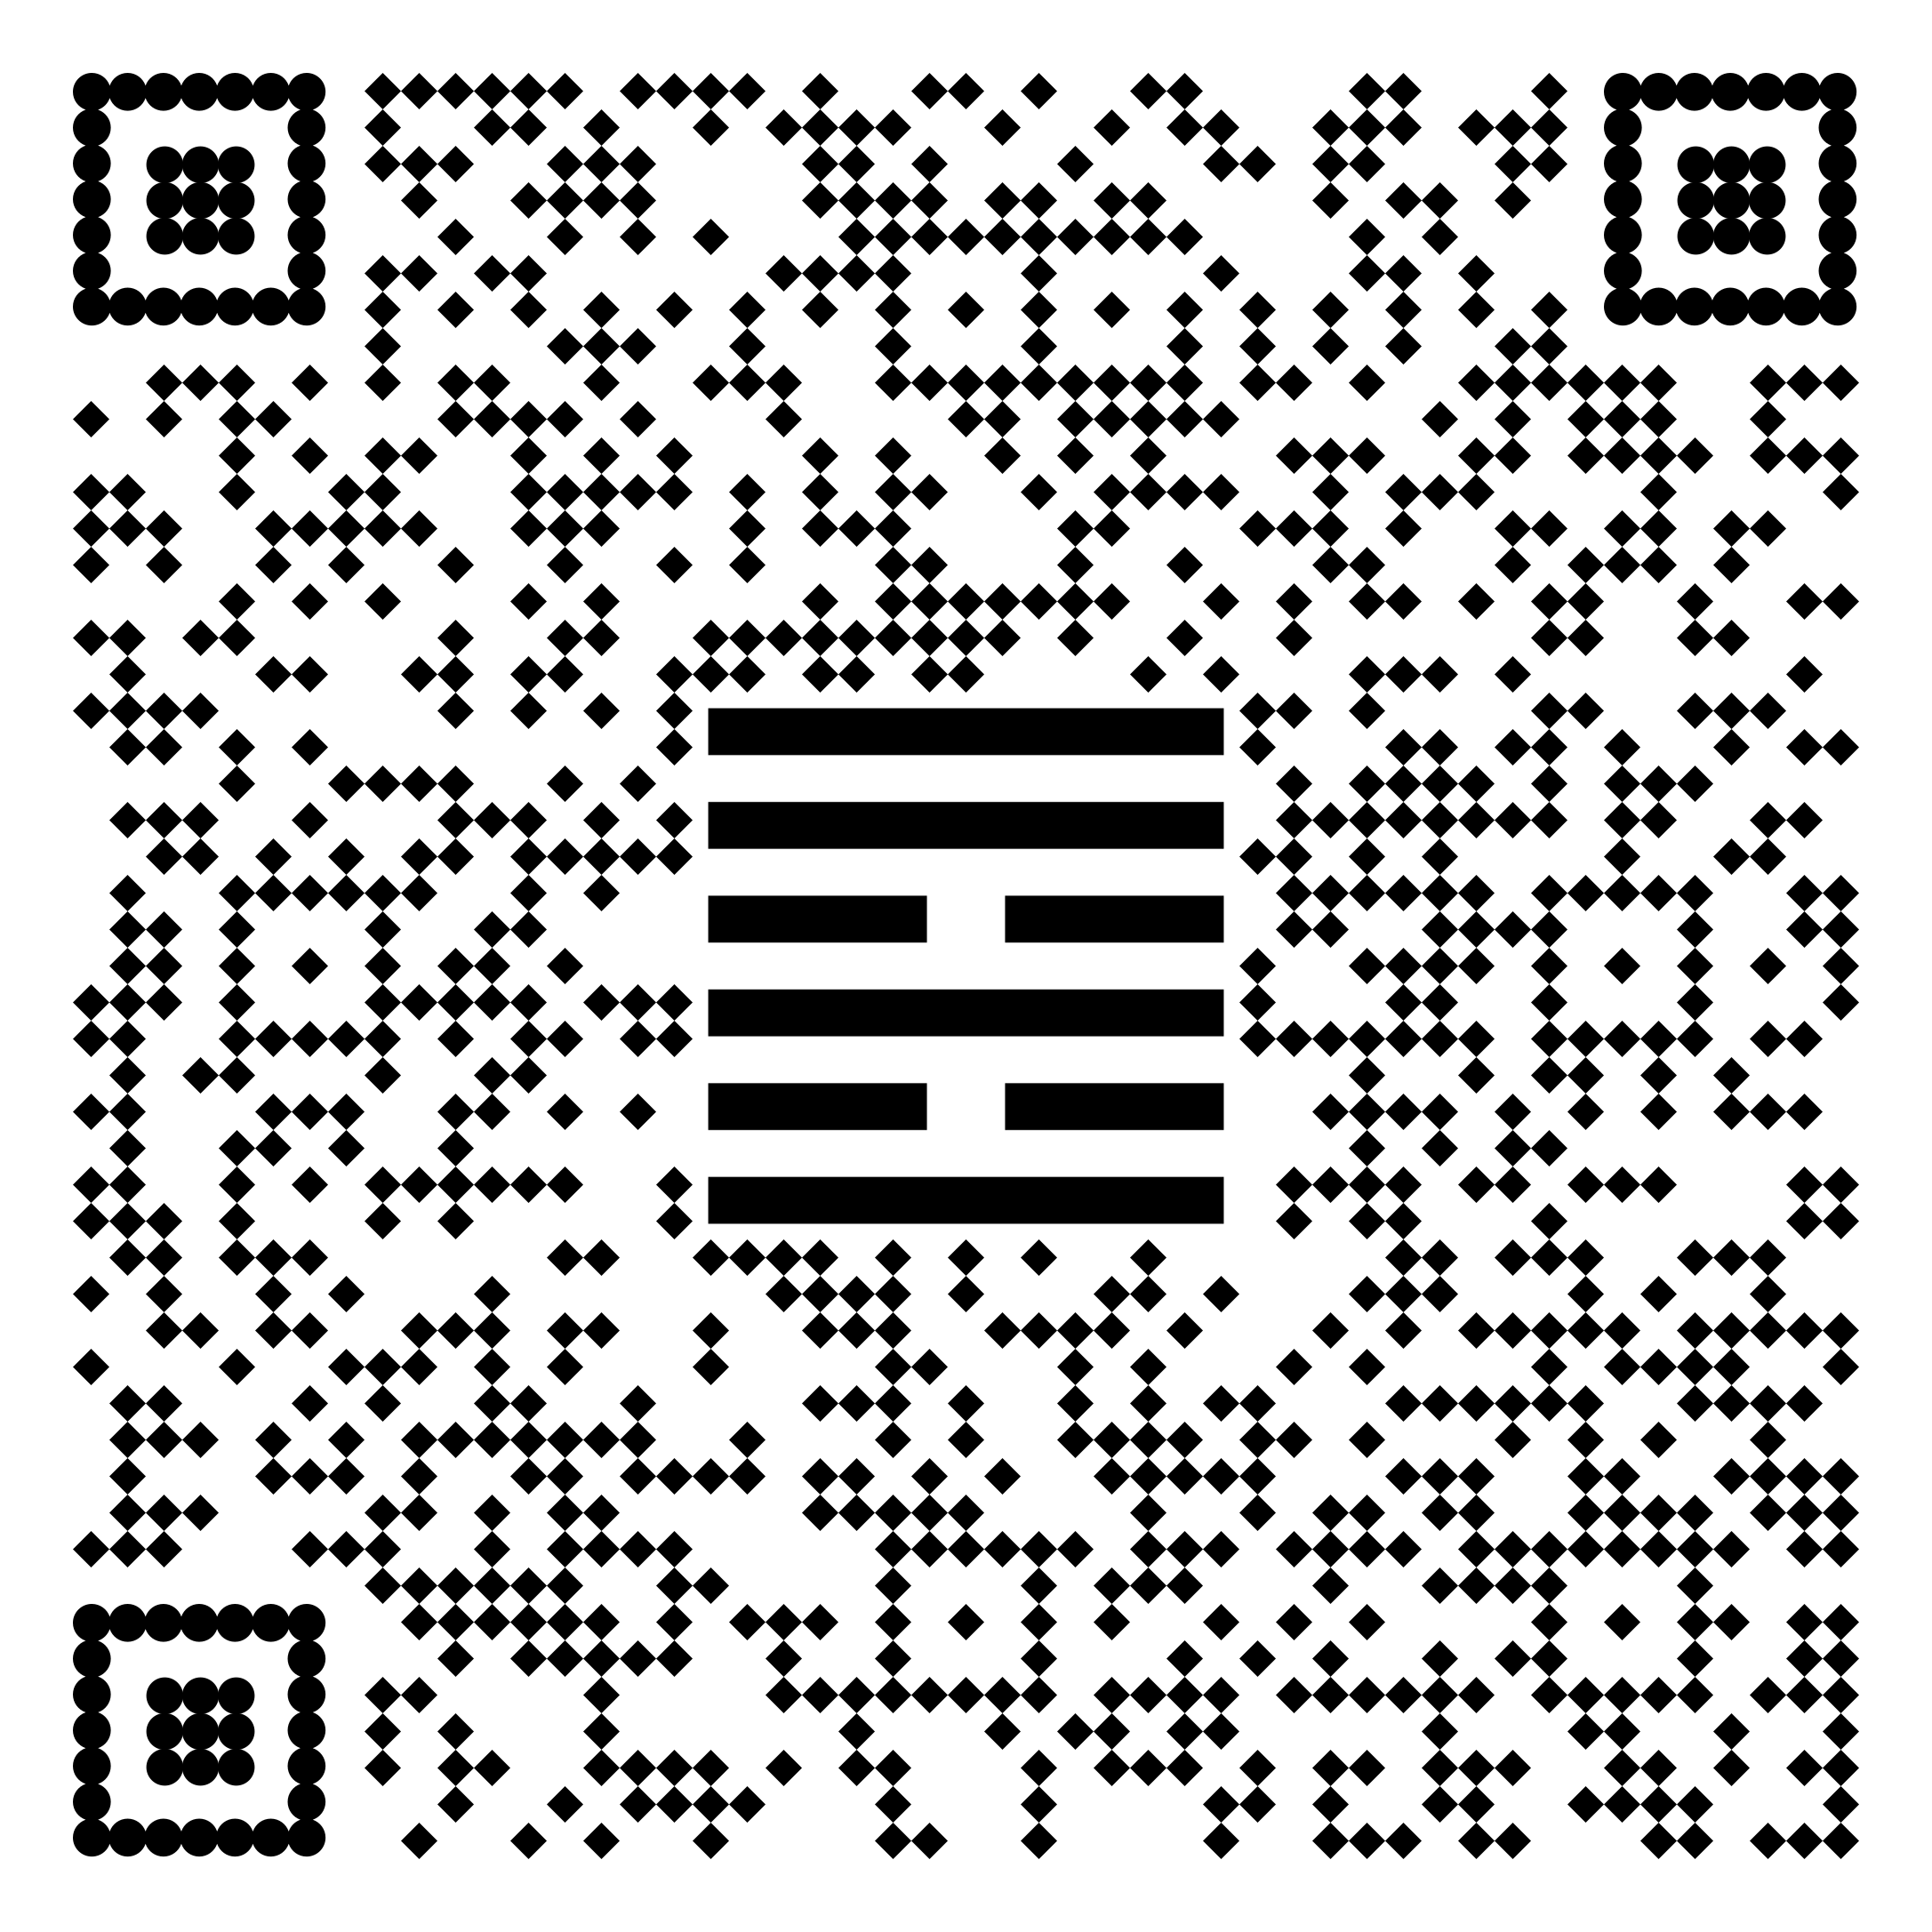 qr-code-37.png